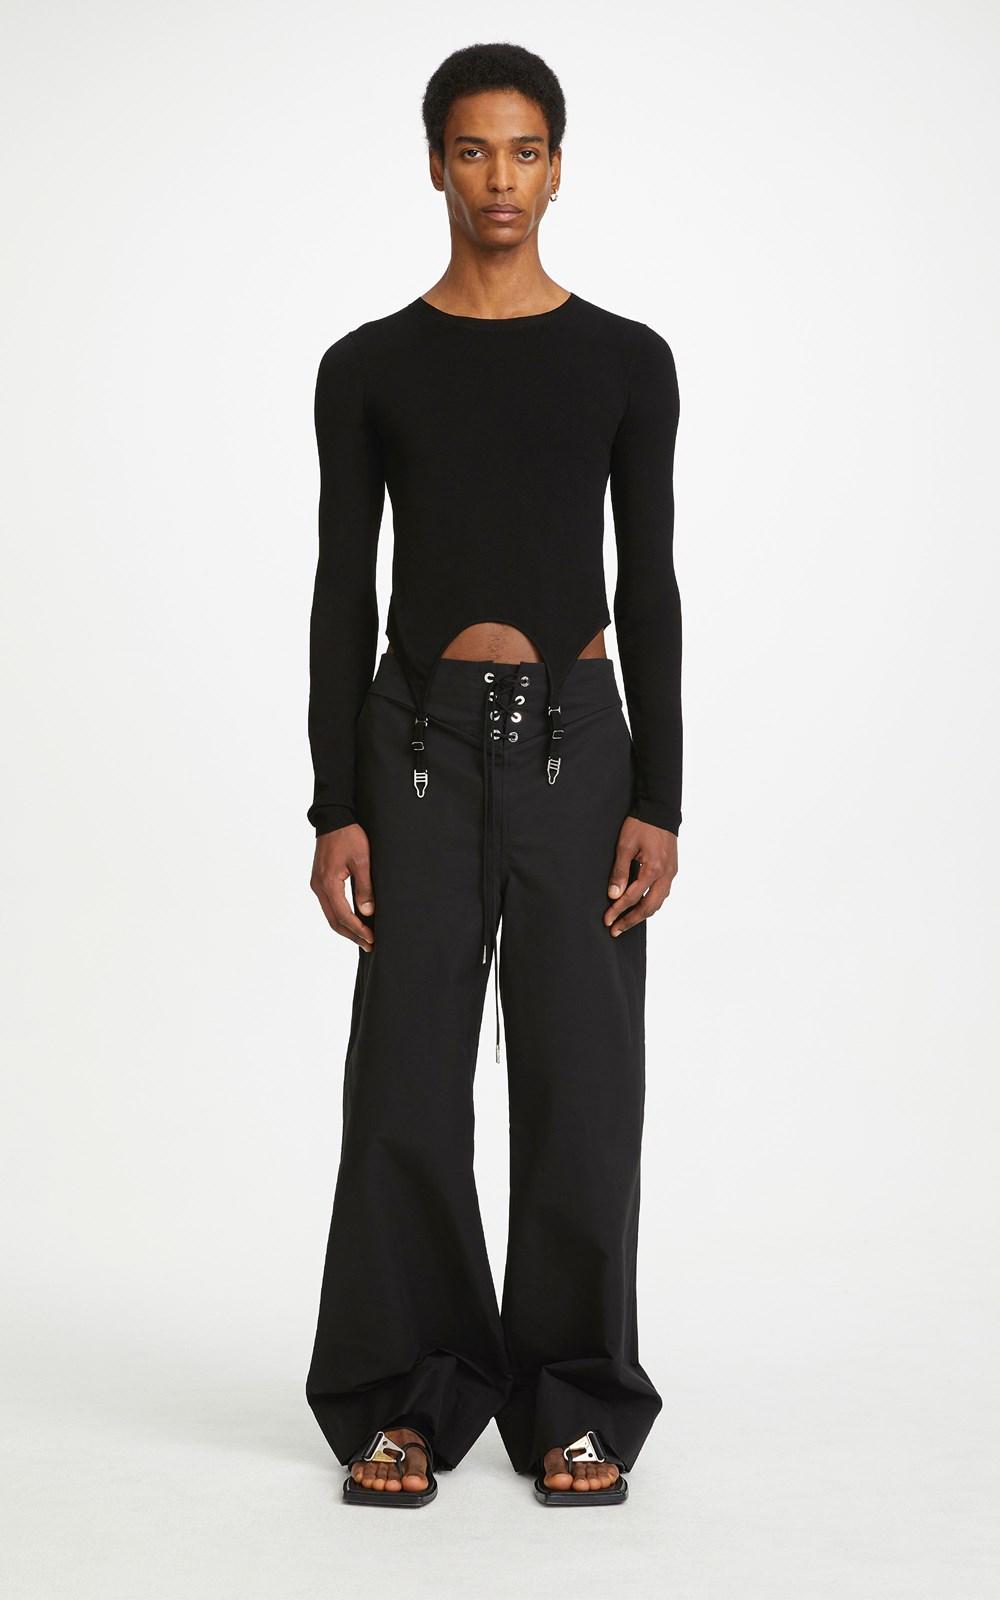 Pants | TAEKWONDO SKI PANT